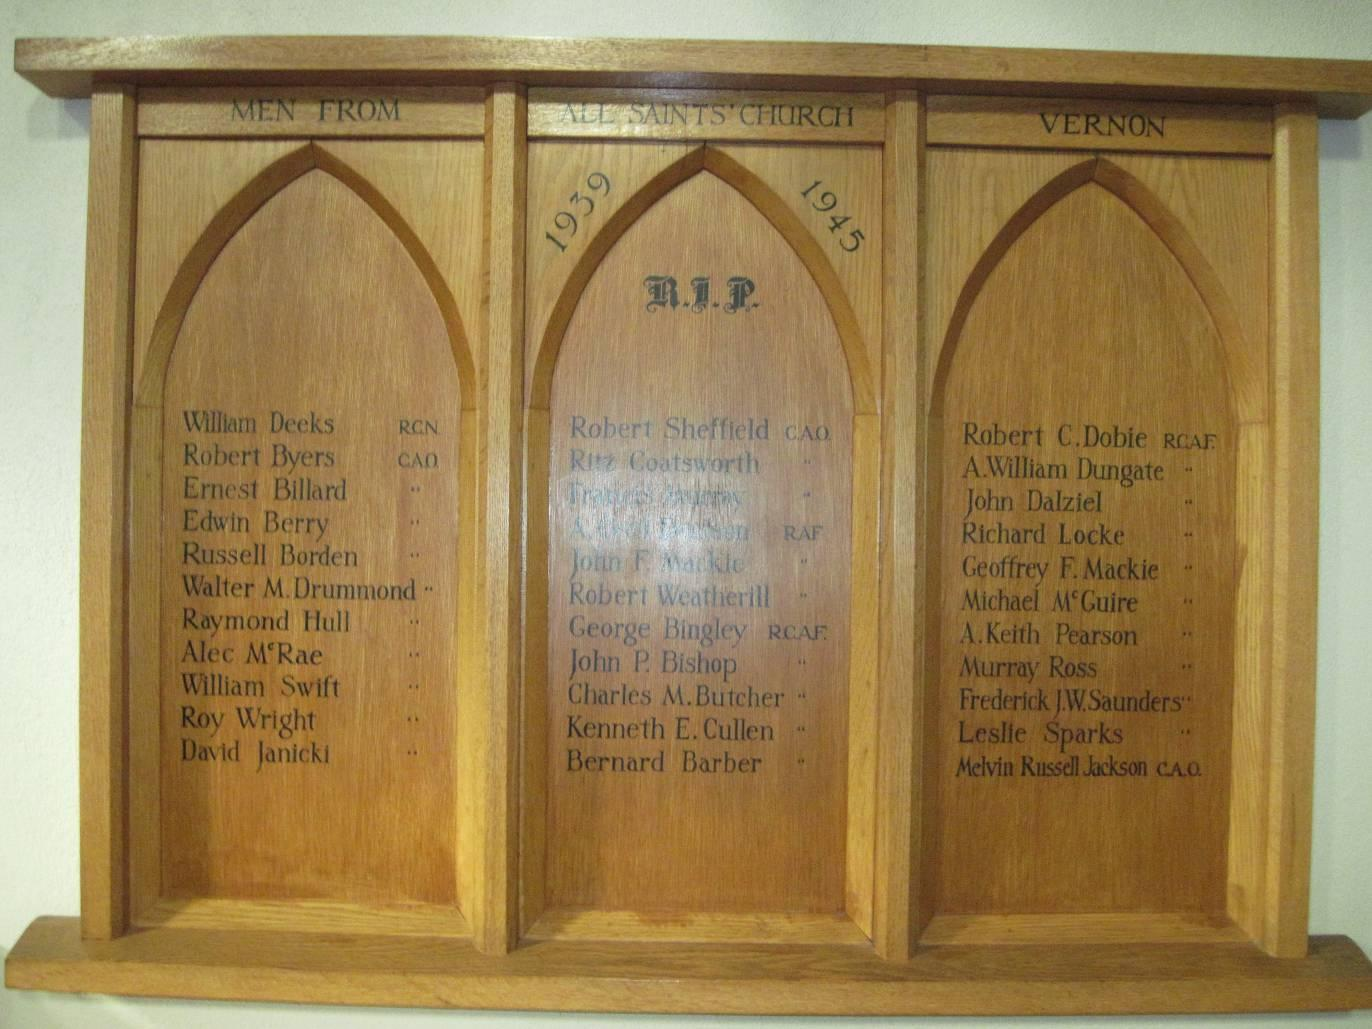 Memorial– All Saints Church, Vernon, BC - Memorial Listing A. William Dungate